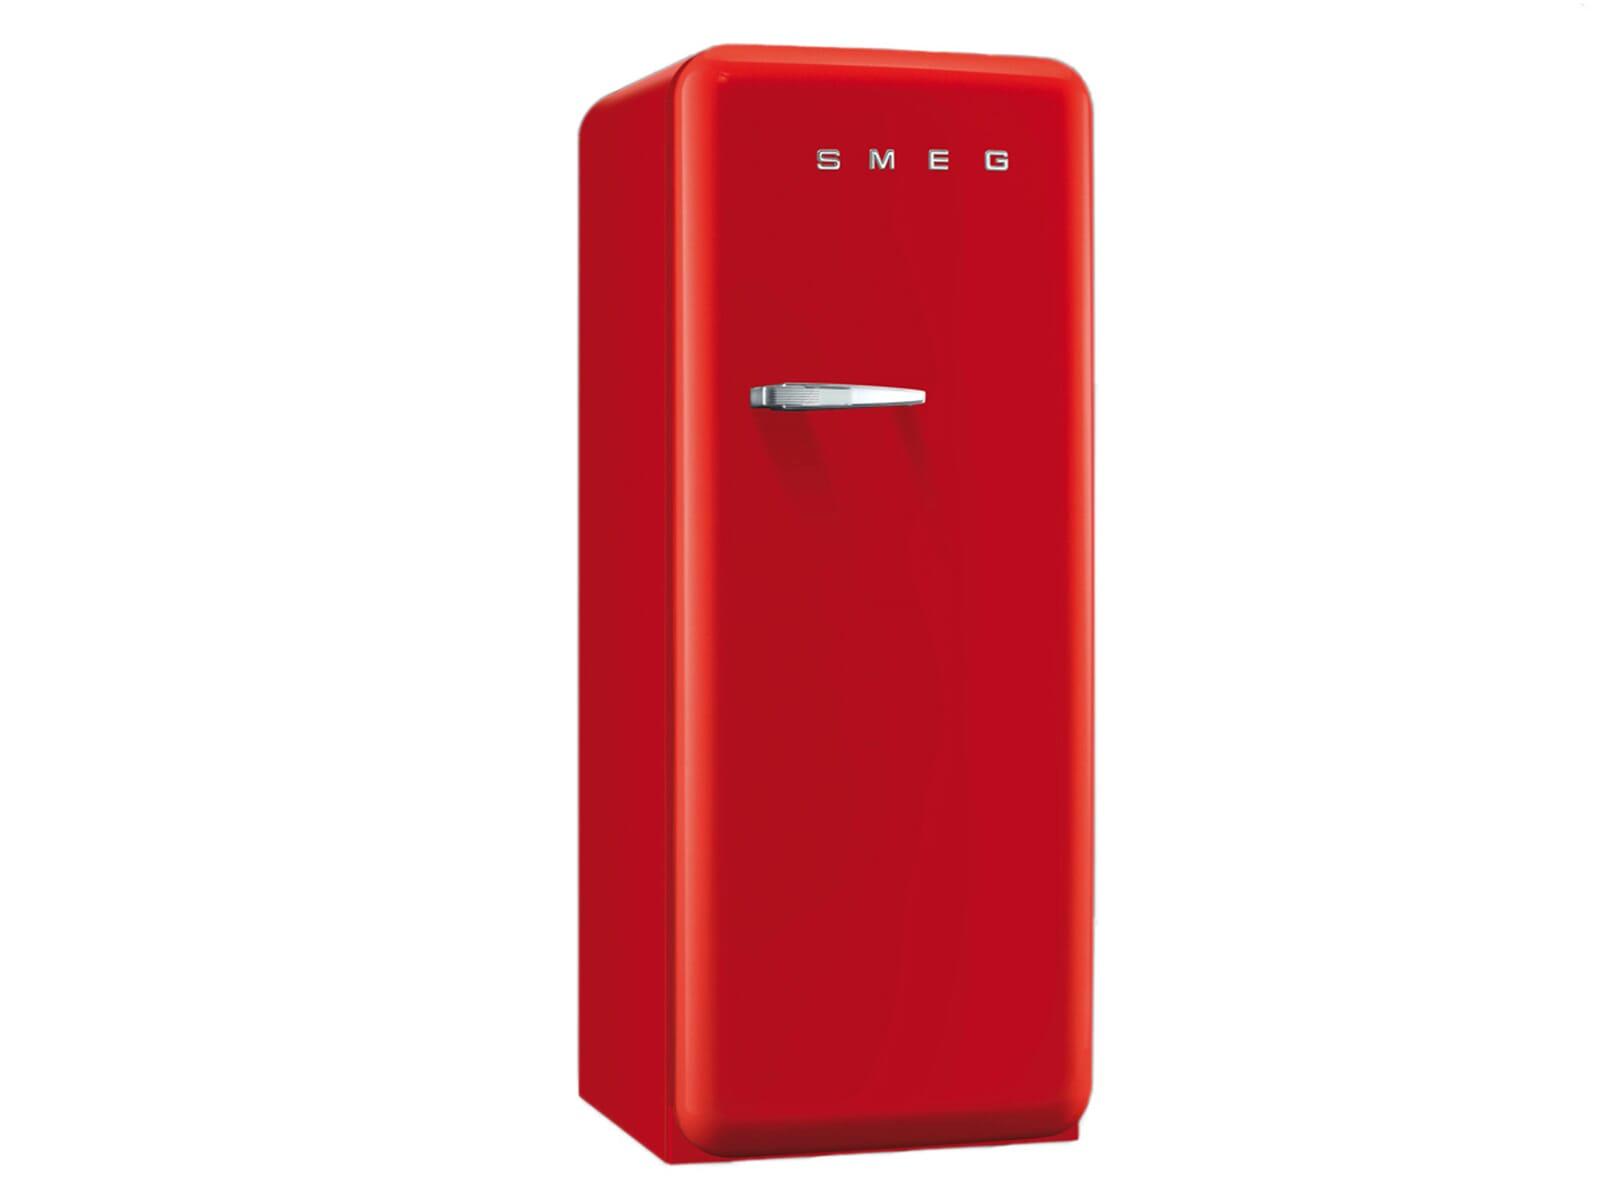 Amerikanischer Kühlschrank Smeg : Smeg cvb rr standgefrierschrank rot